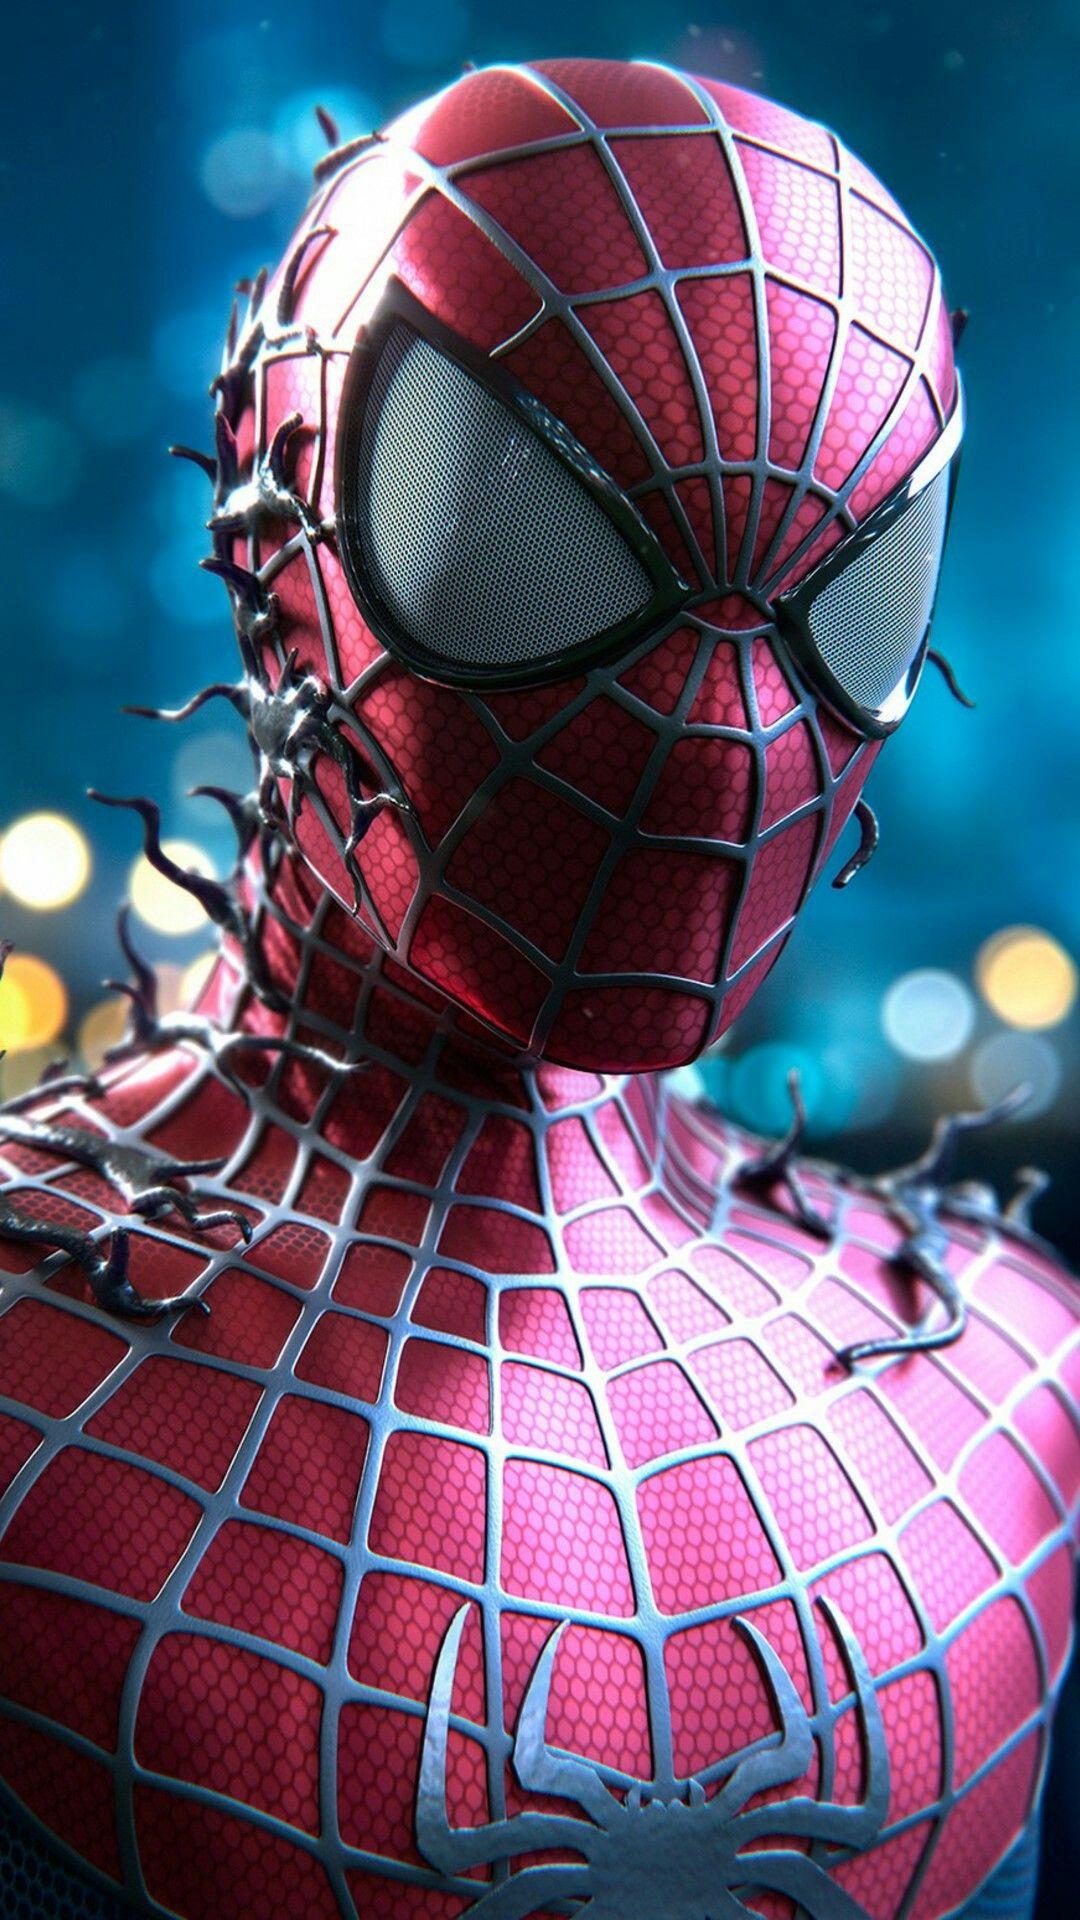 Pin de William Tackett en More of Spiderman Hombre araña